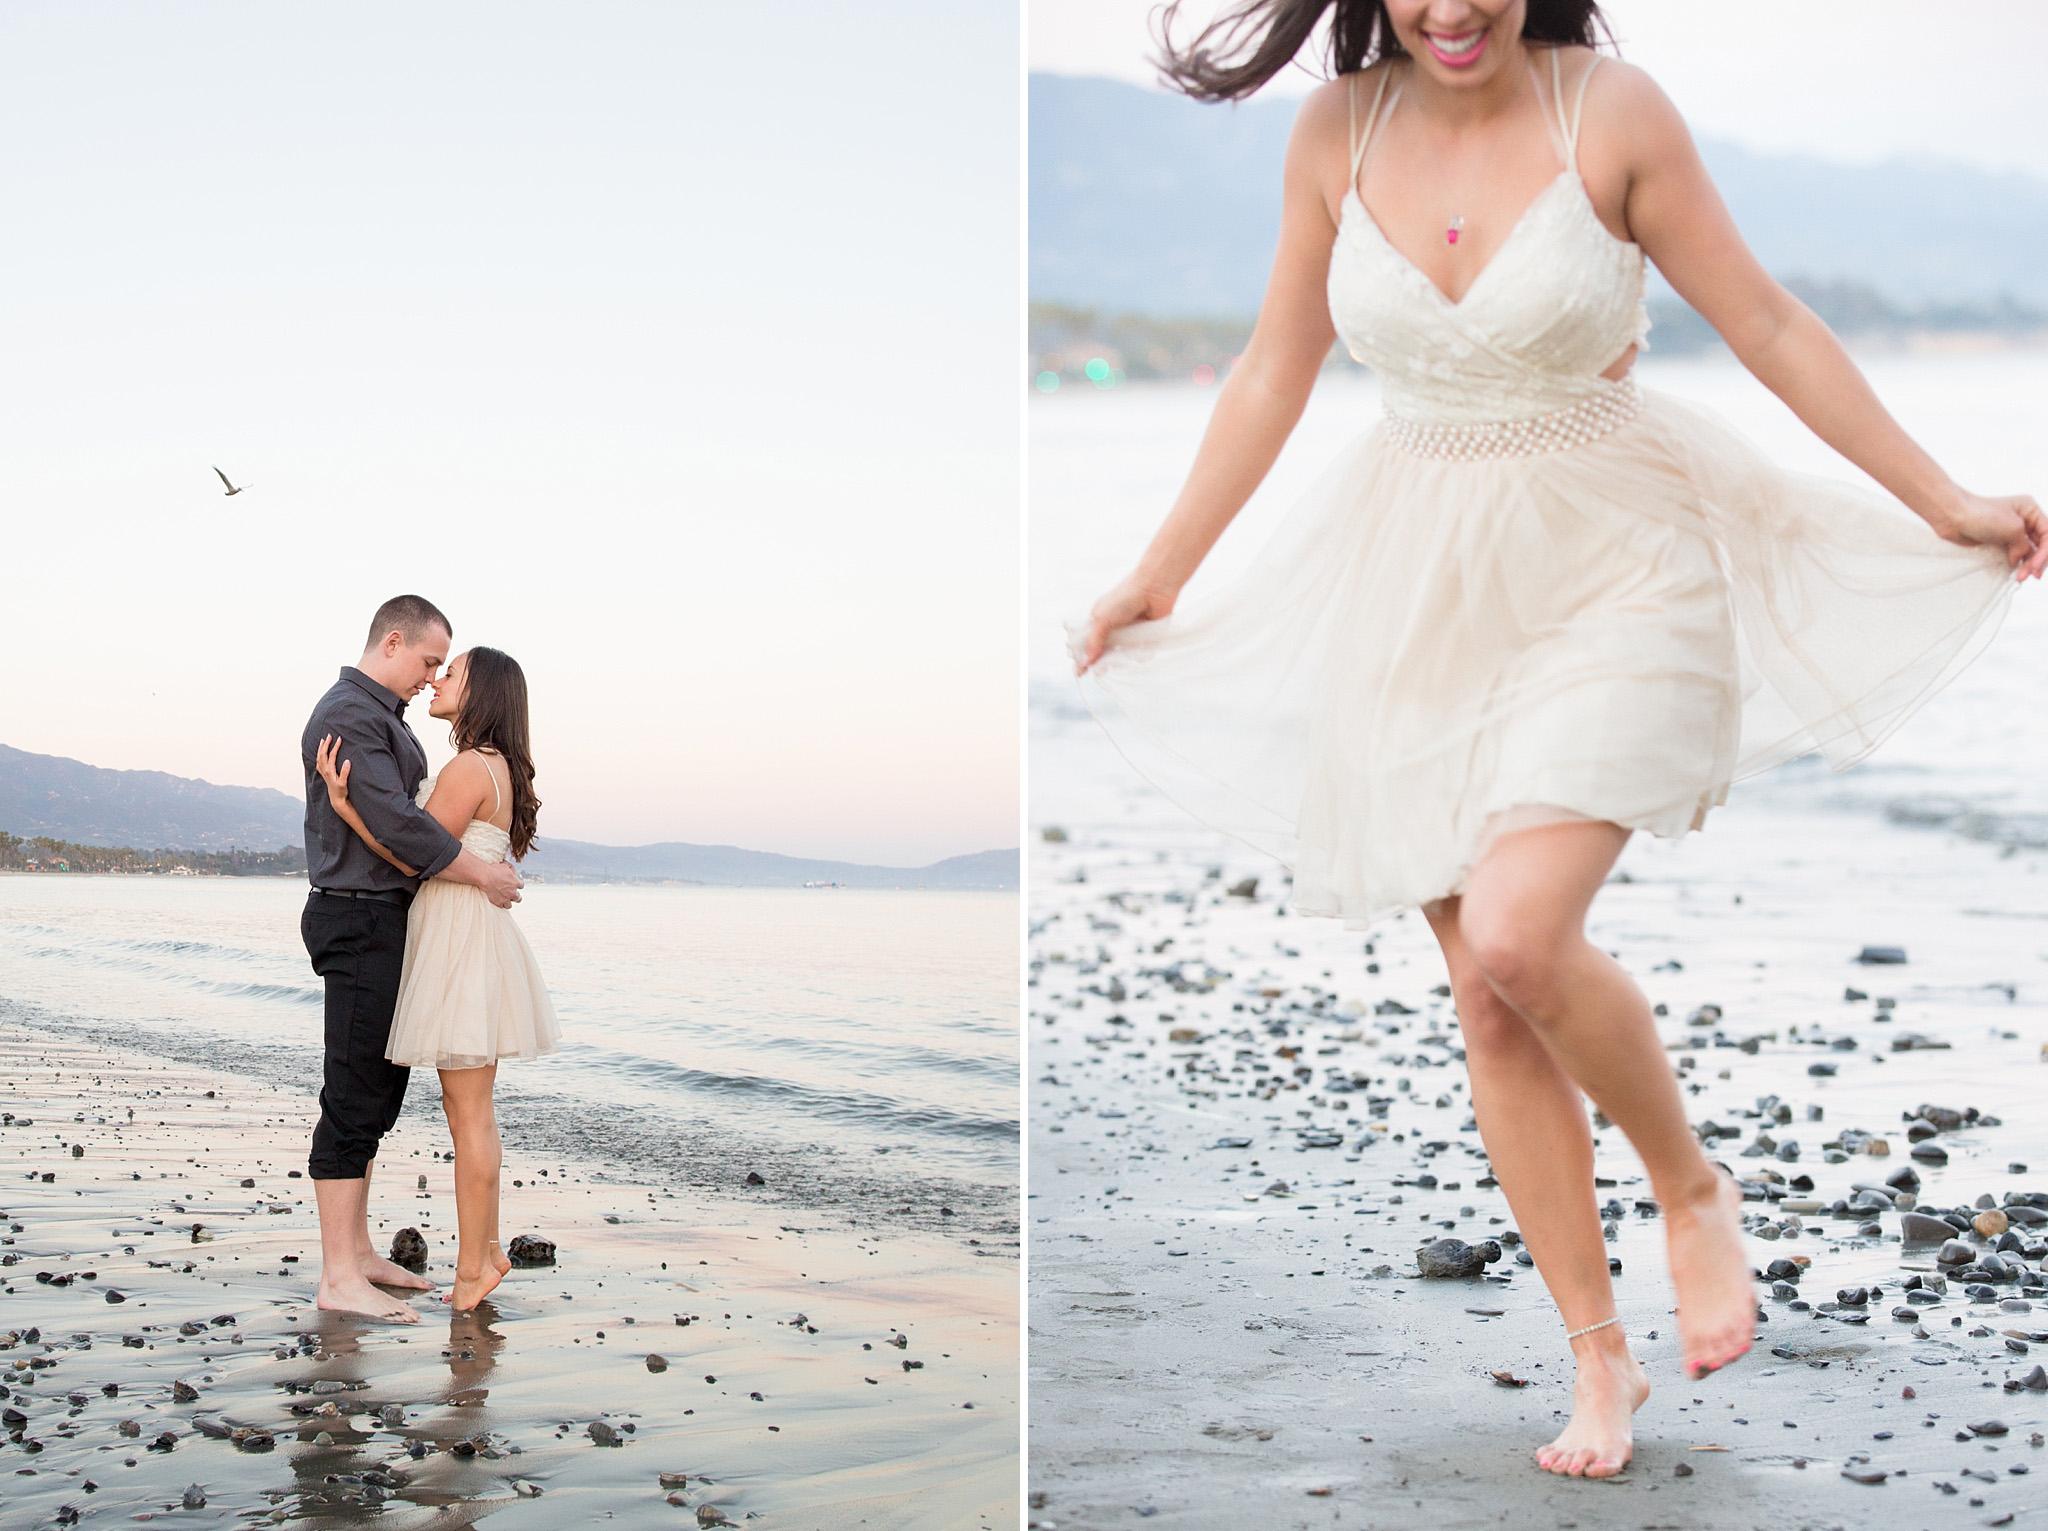 EngagementSessionPhotography_MichelleGirard07.jpg